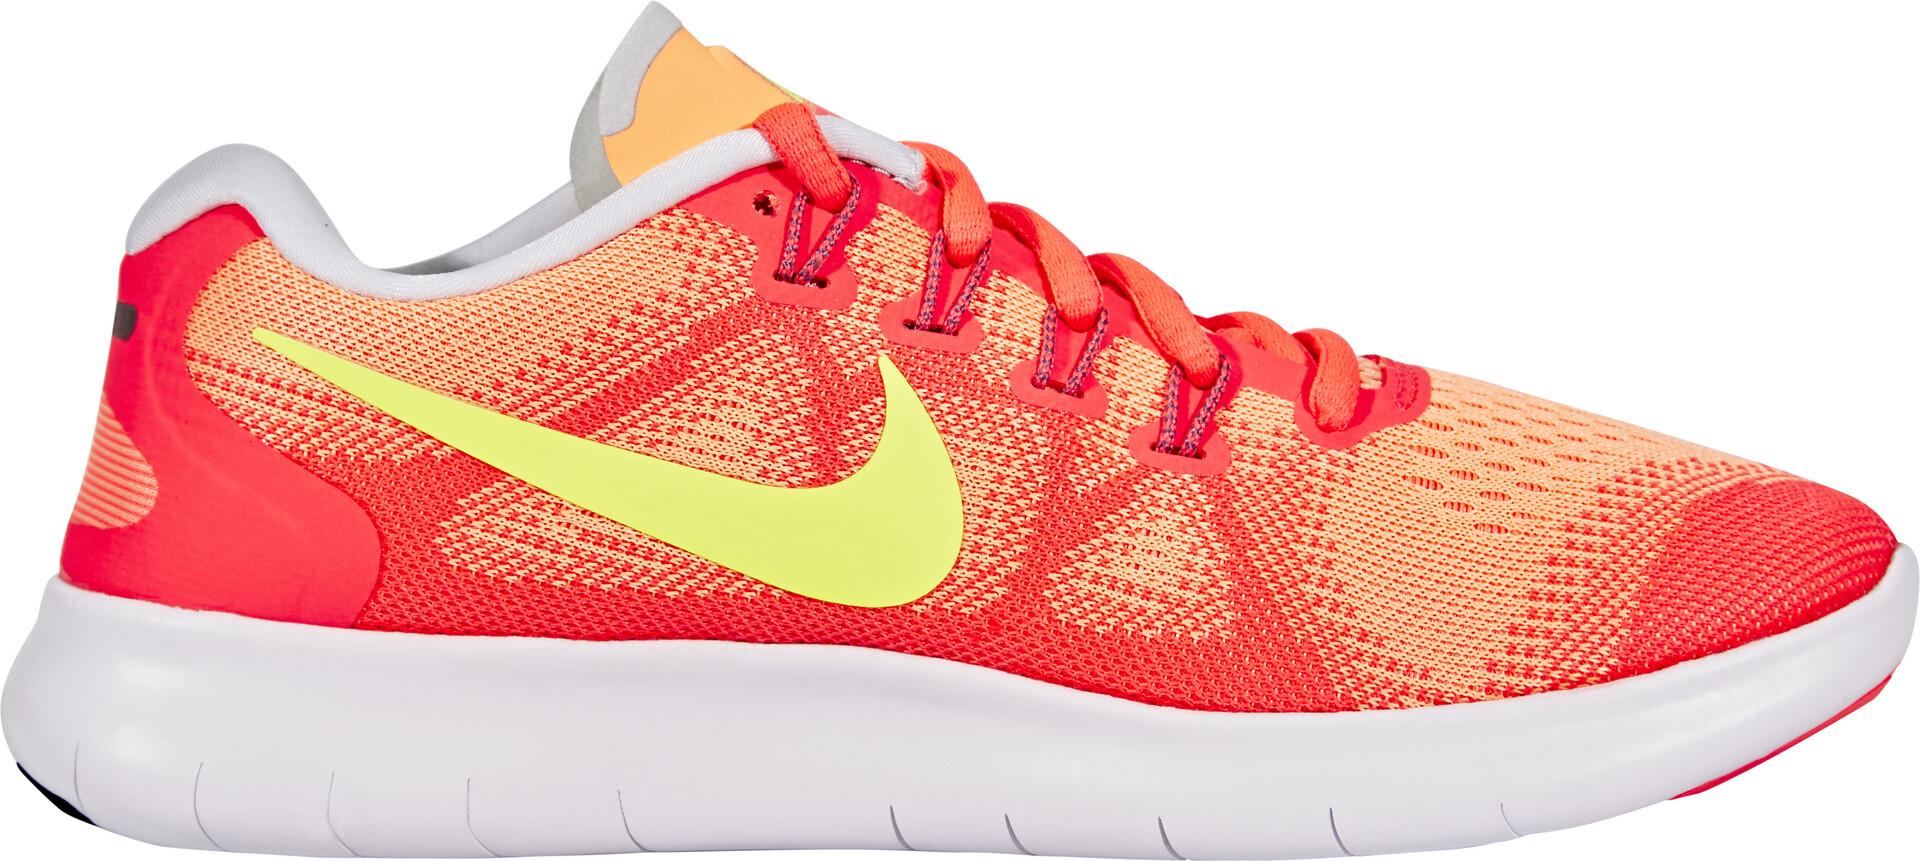 Løpesko Running GulOrangeGode Nike 2 Free Dame hos tilbud RN Y7b6ygf